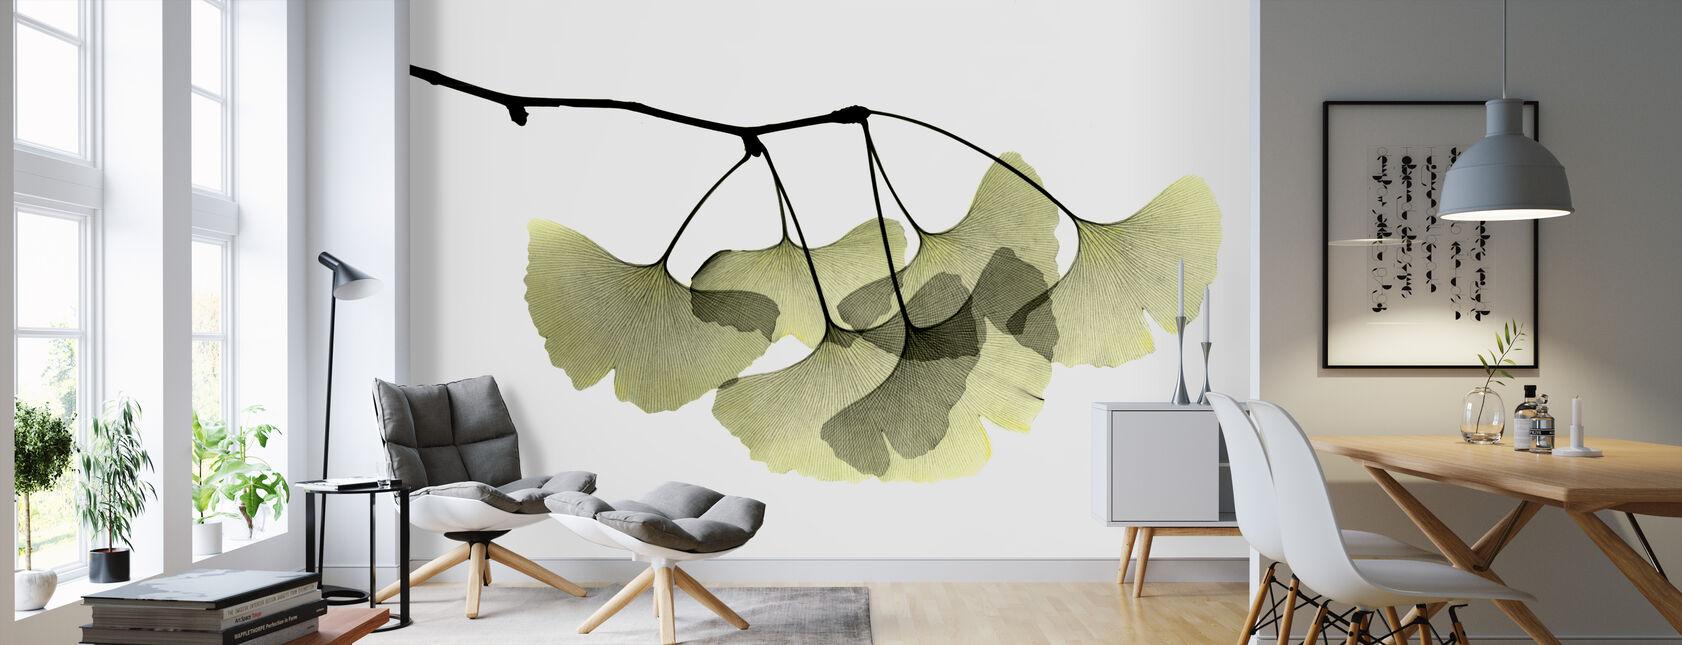 Ginkgo Biloba - Wallpaper - Living Room